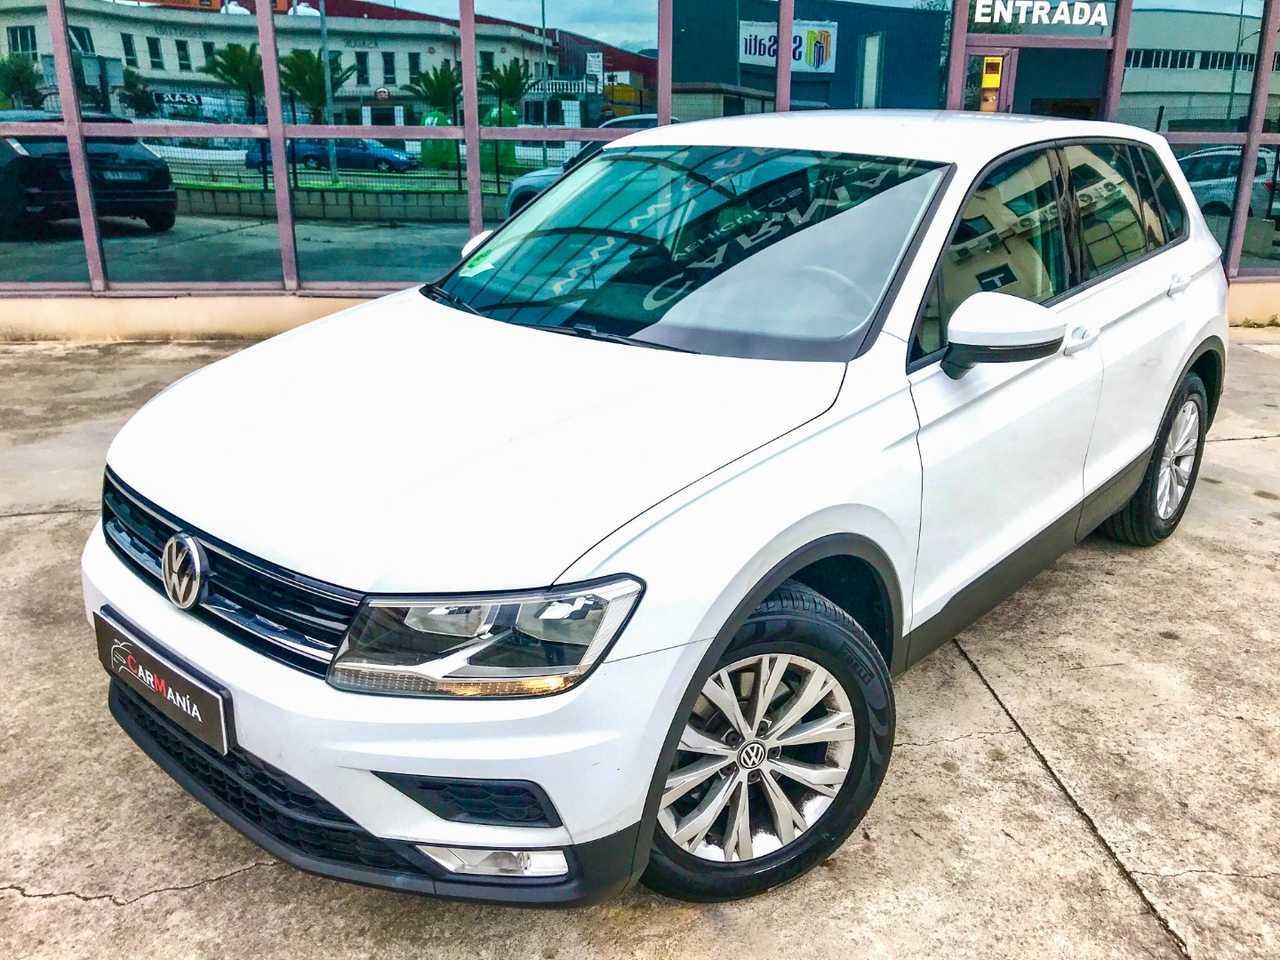 Volkswagen Tiguan 2.0 TDI BLUEMOTION  - Foto 1